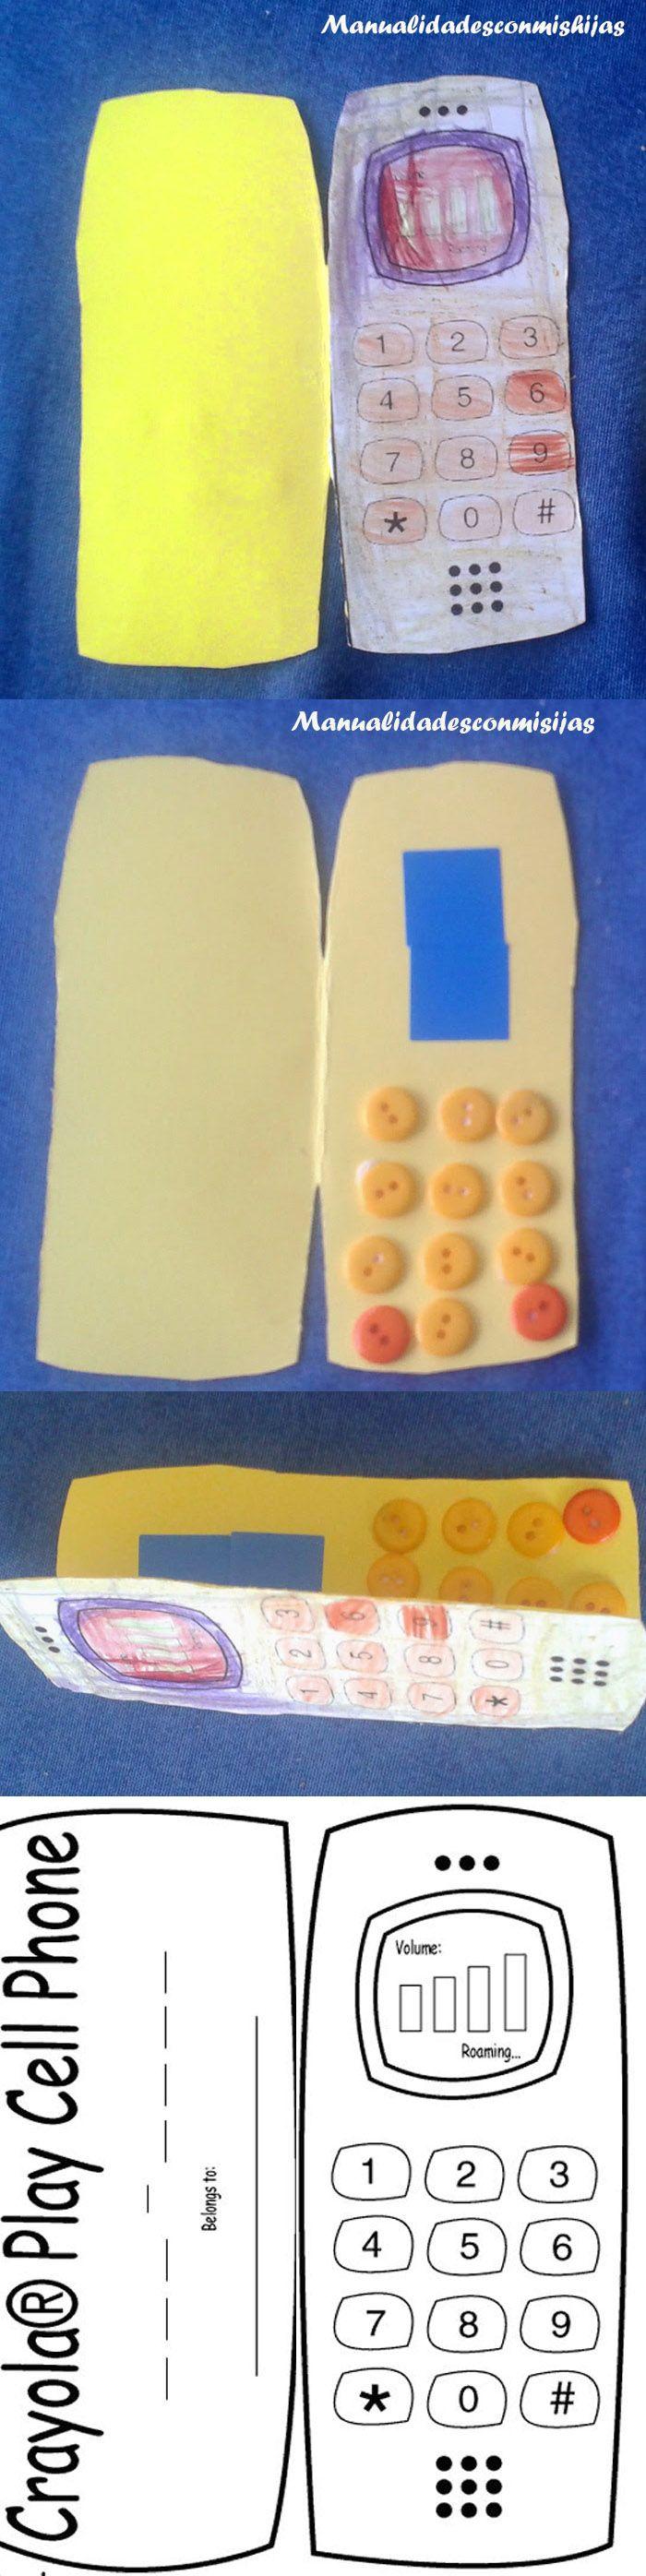 Manualidadesconmishijas. Tarjeta de movil y sus botones. Molde. Tempalte. Kids craft. Kids card. Father's day